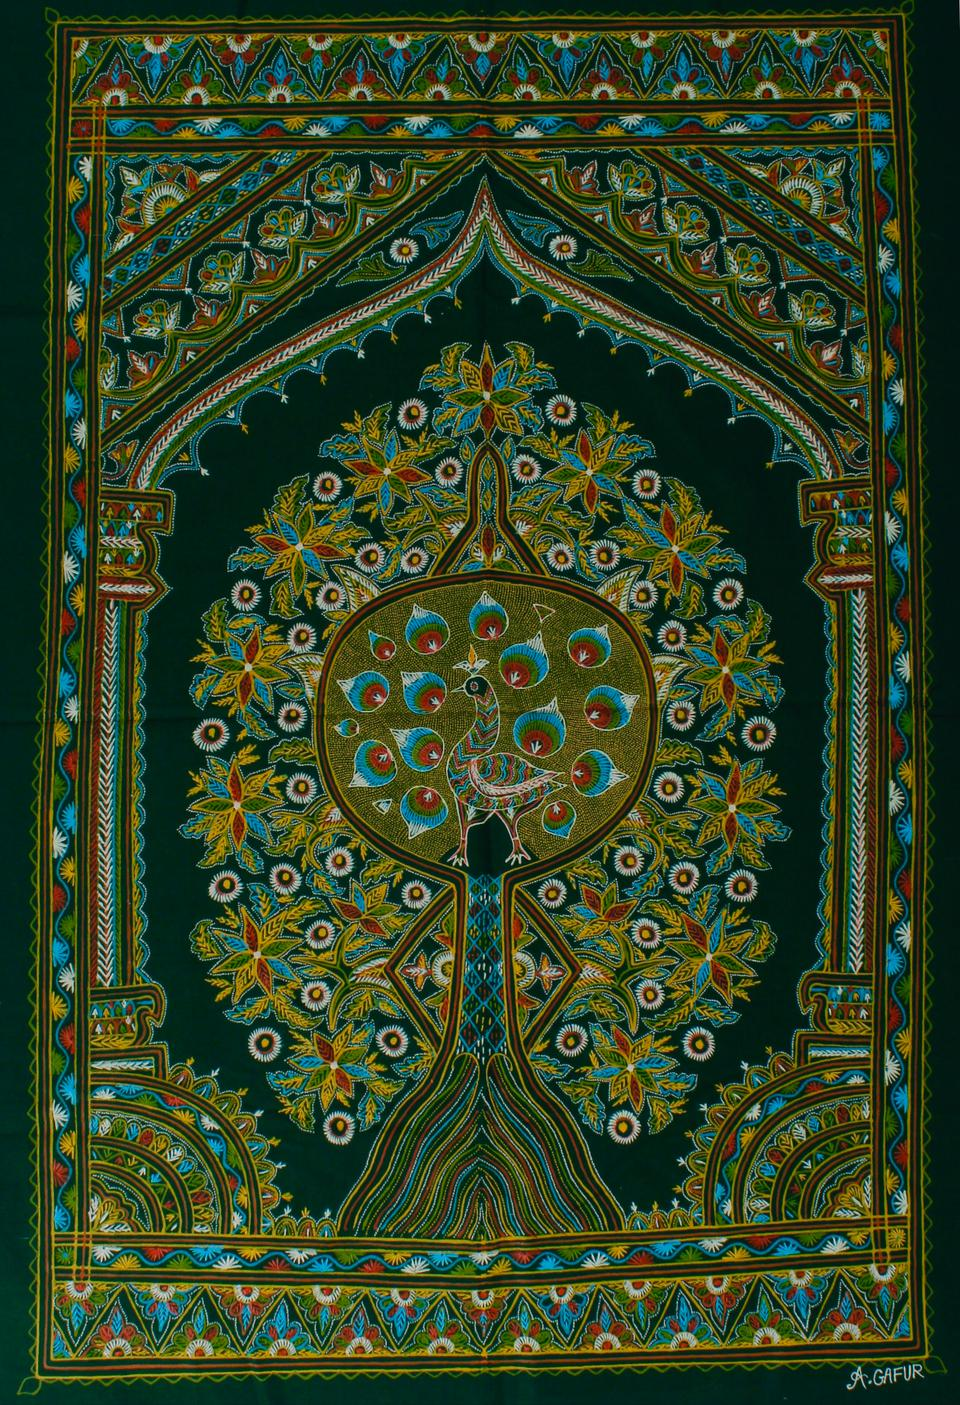 Rogan Art depicting the Tree of Life by Abdul Gafur Khatri.